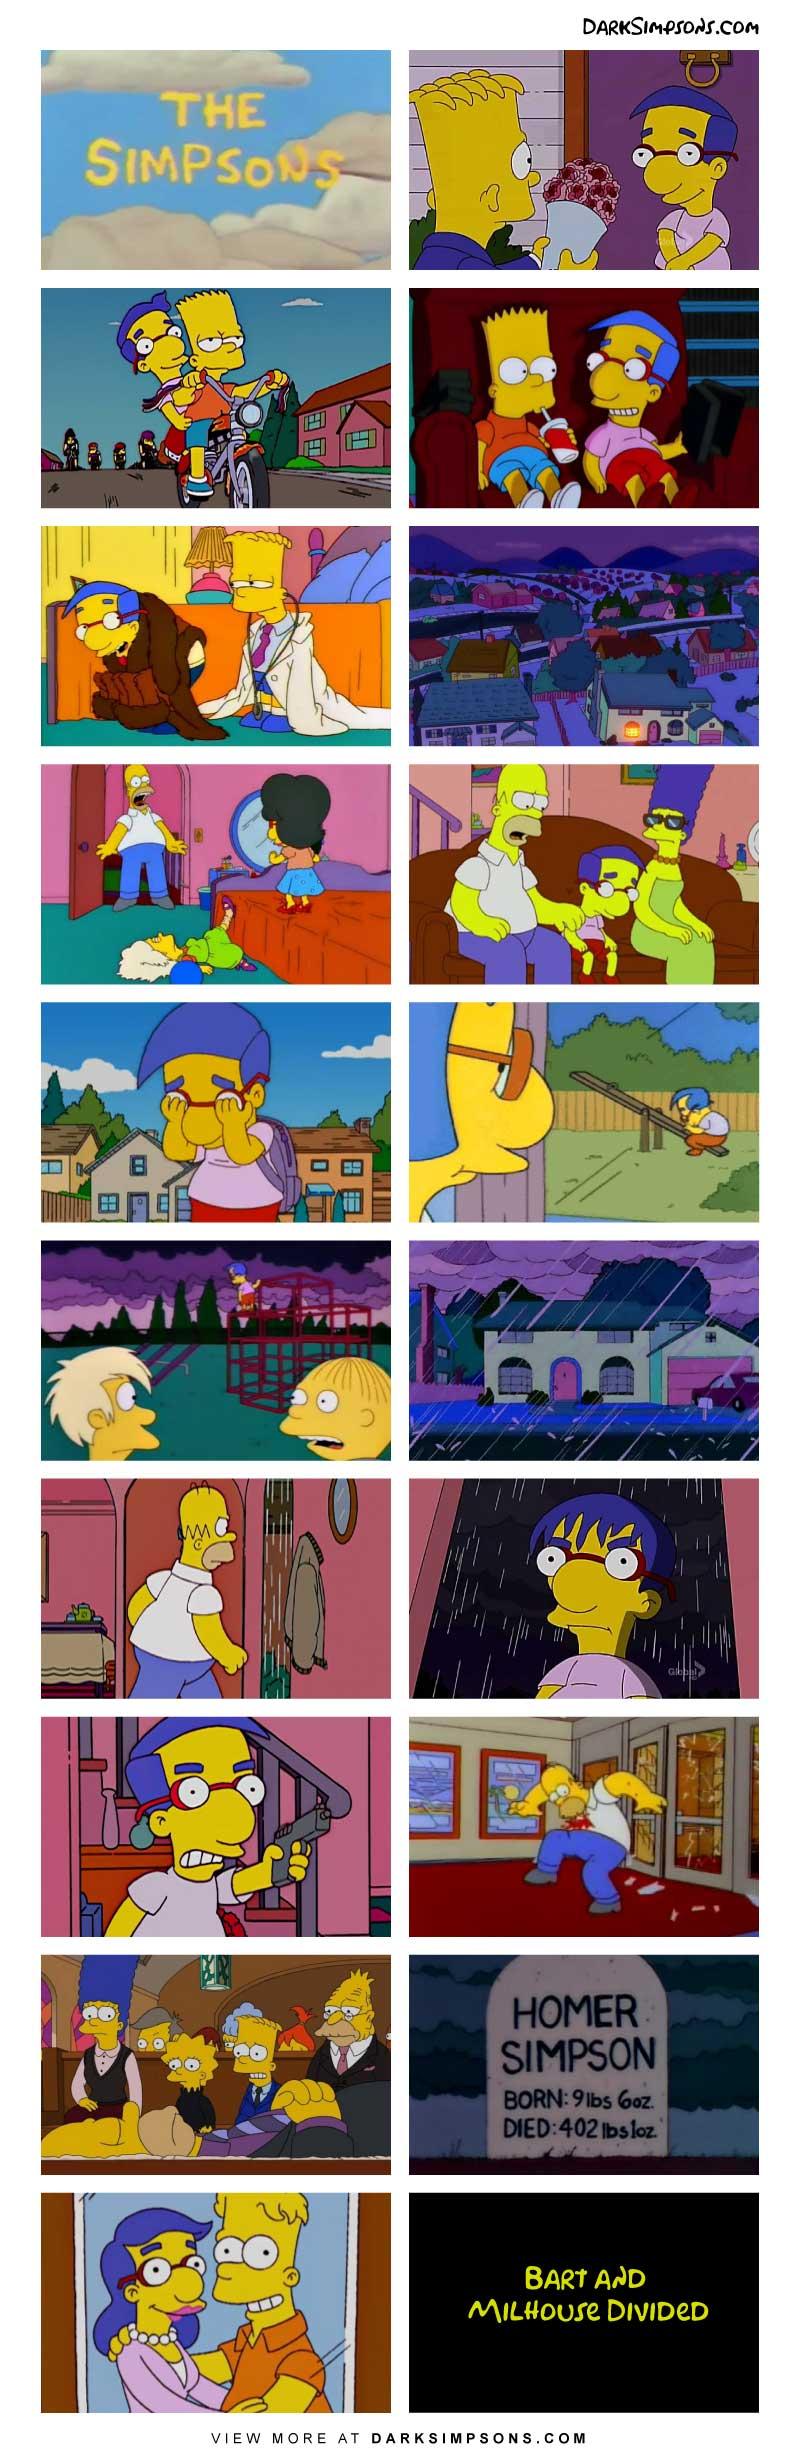 Bart Fucks Milhouse co/ - comics & cartoons » thread #99485666